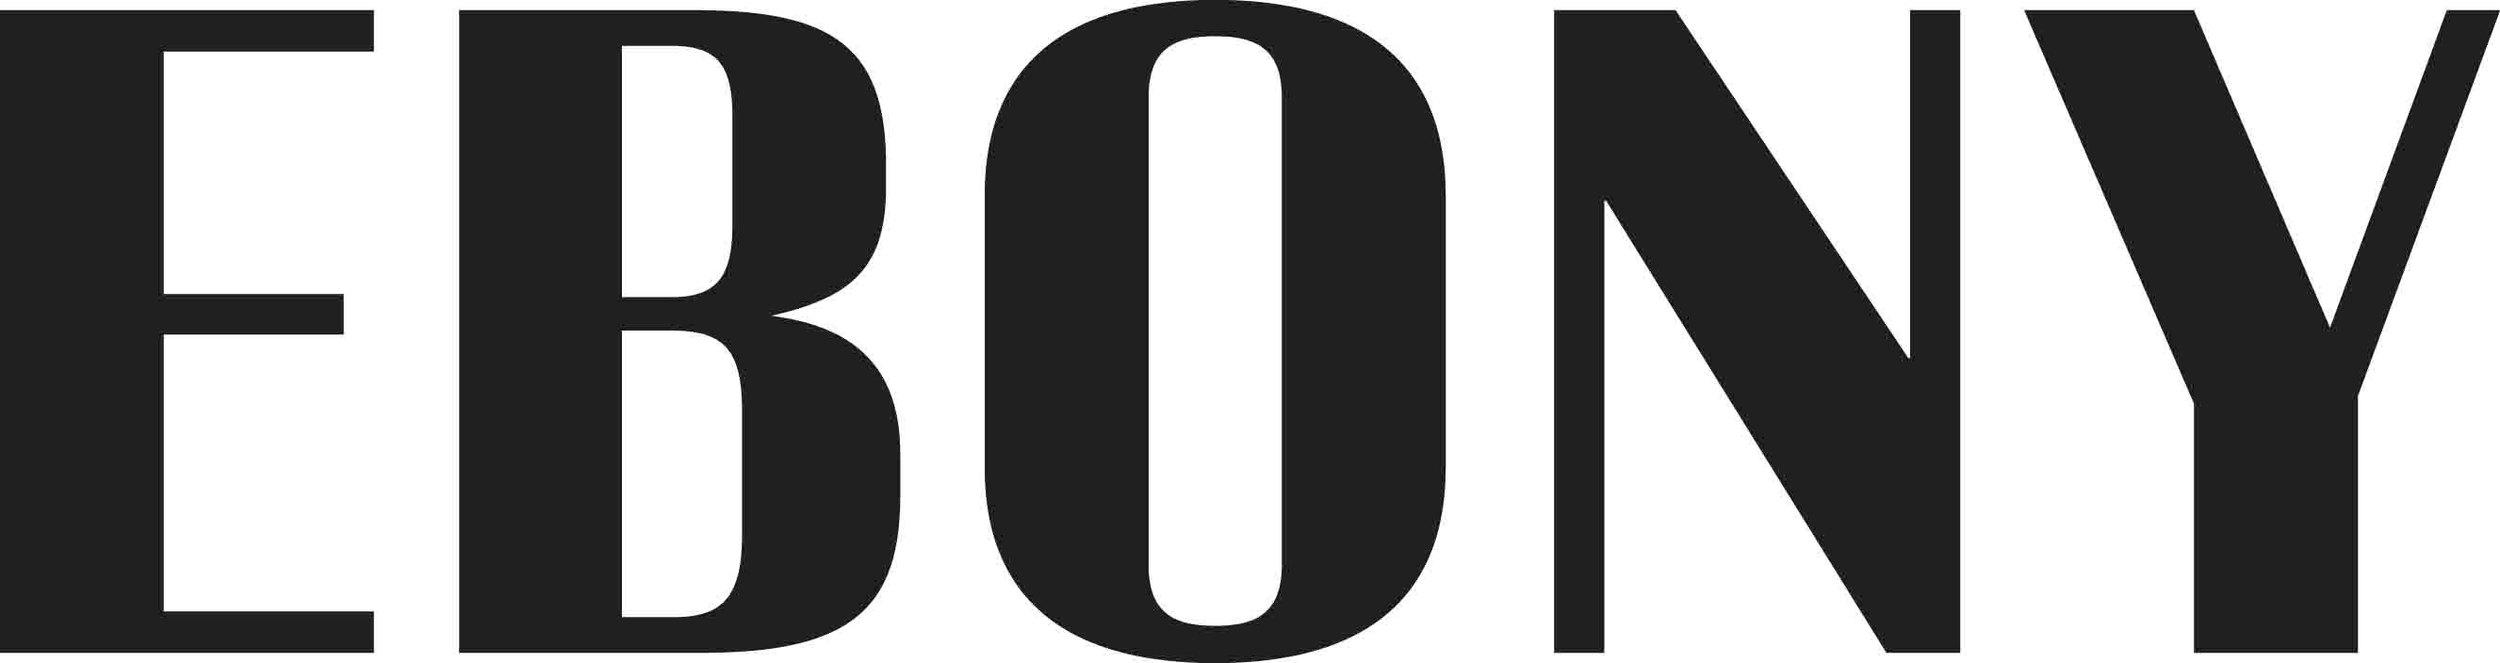 Ebony logo.jpg